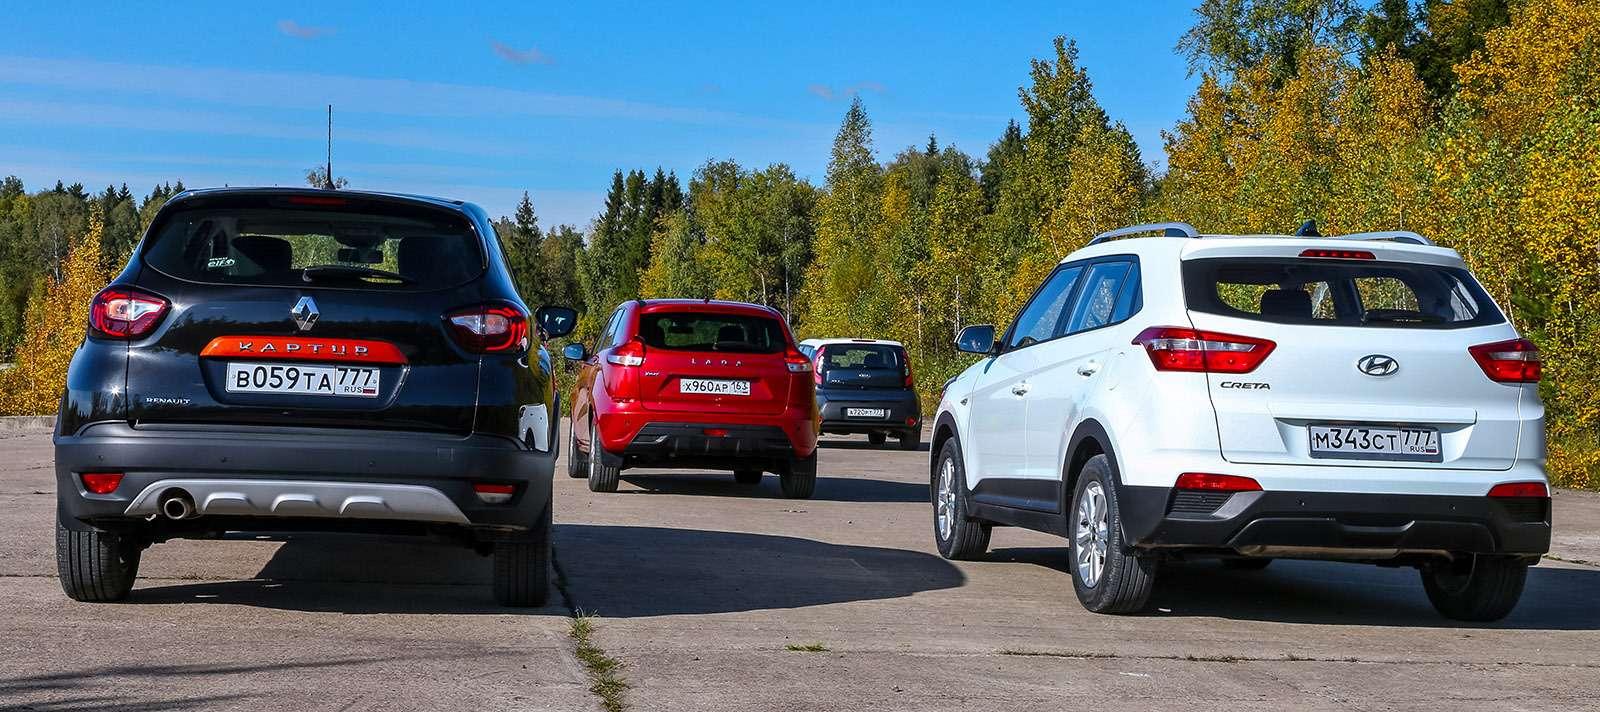 Hyundai Creta, Renault Kaptur, Kia Soul, Lada XRAY: разборка переднеприводных— фото 657328